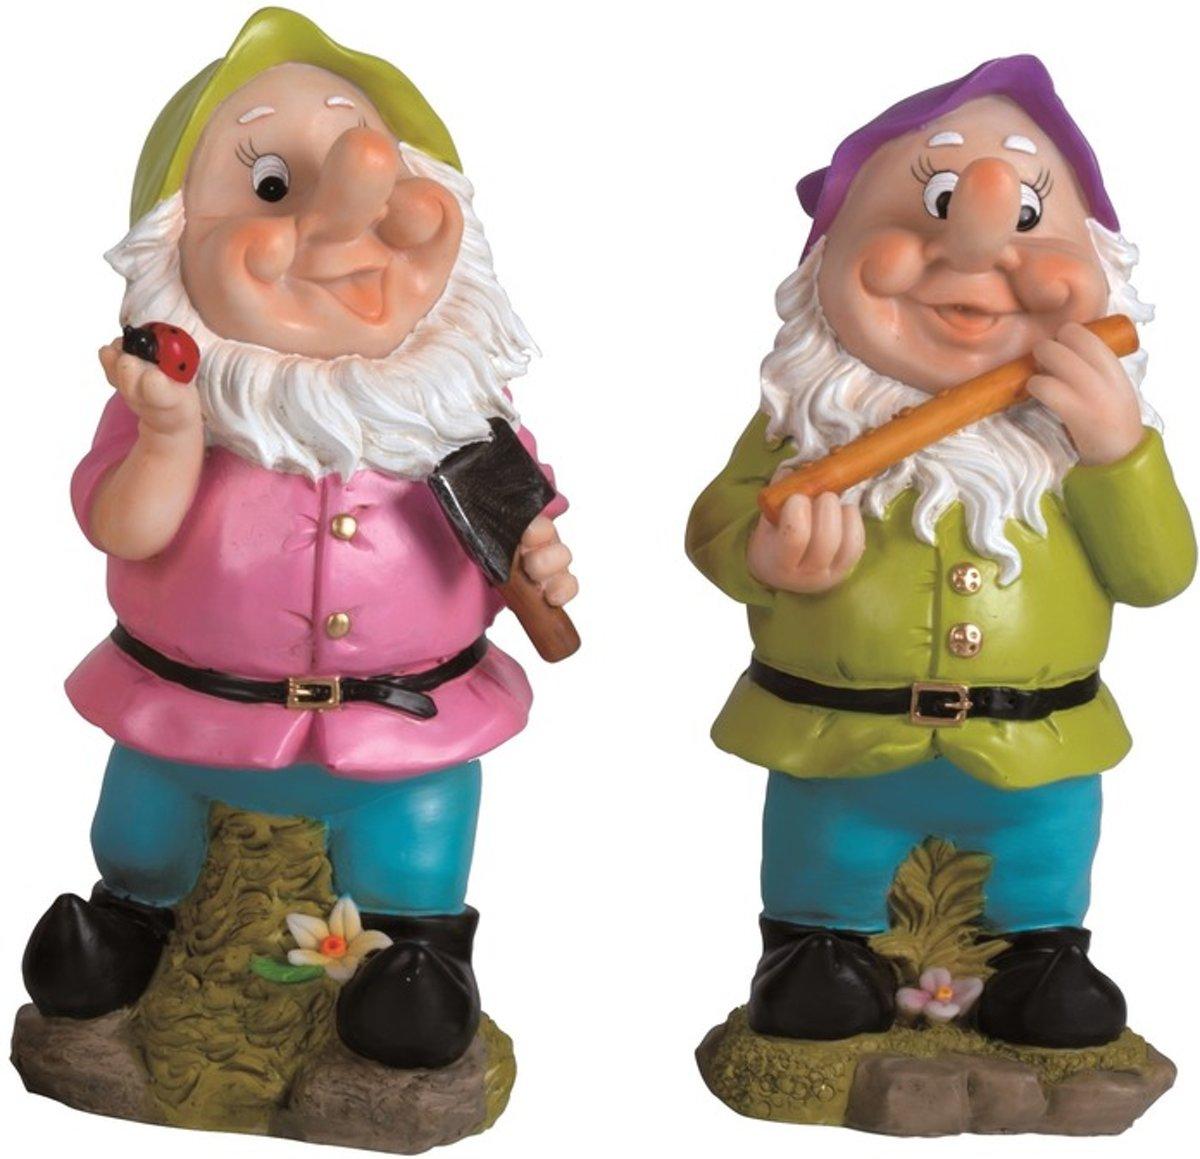 2x Tuinkabouters 30 cm groene/paarse mutsen